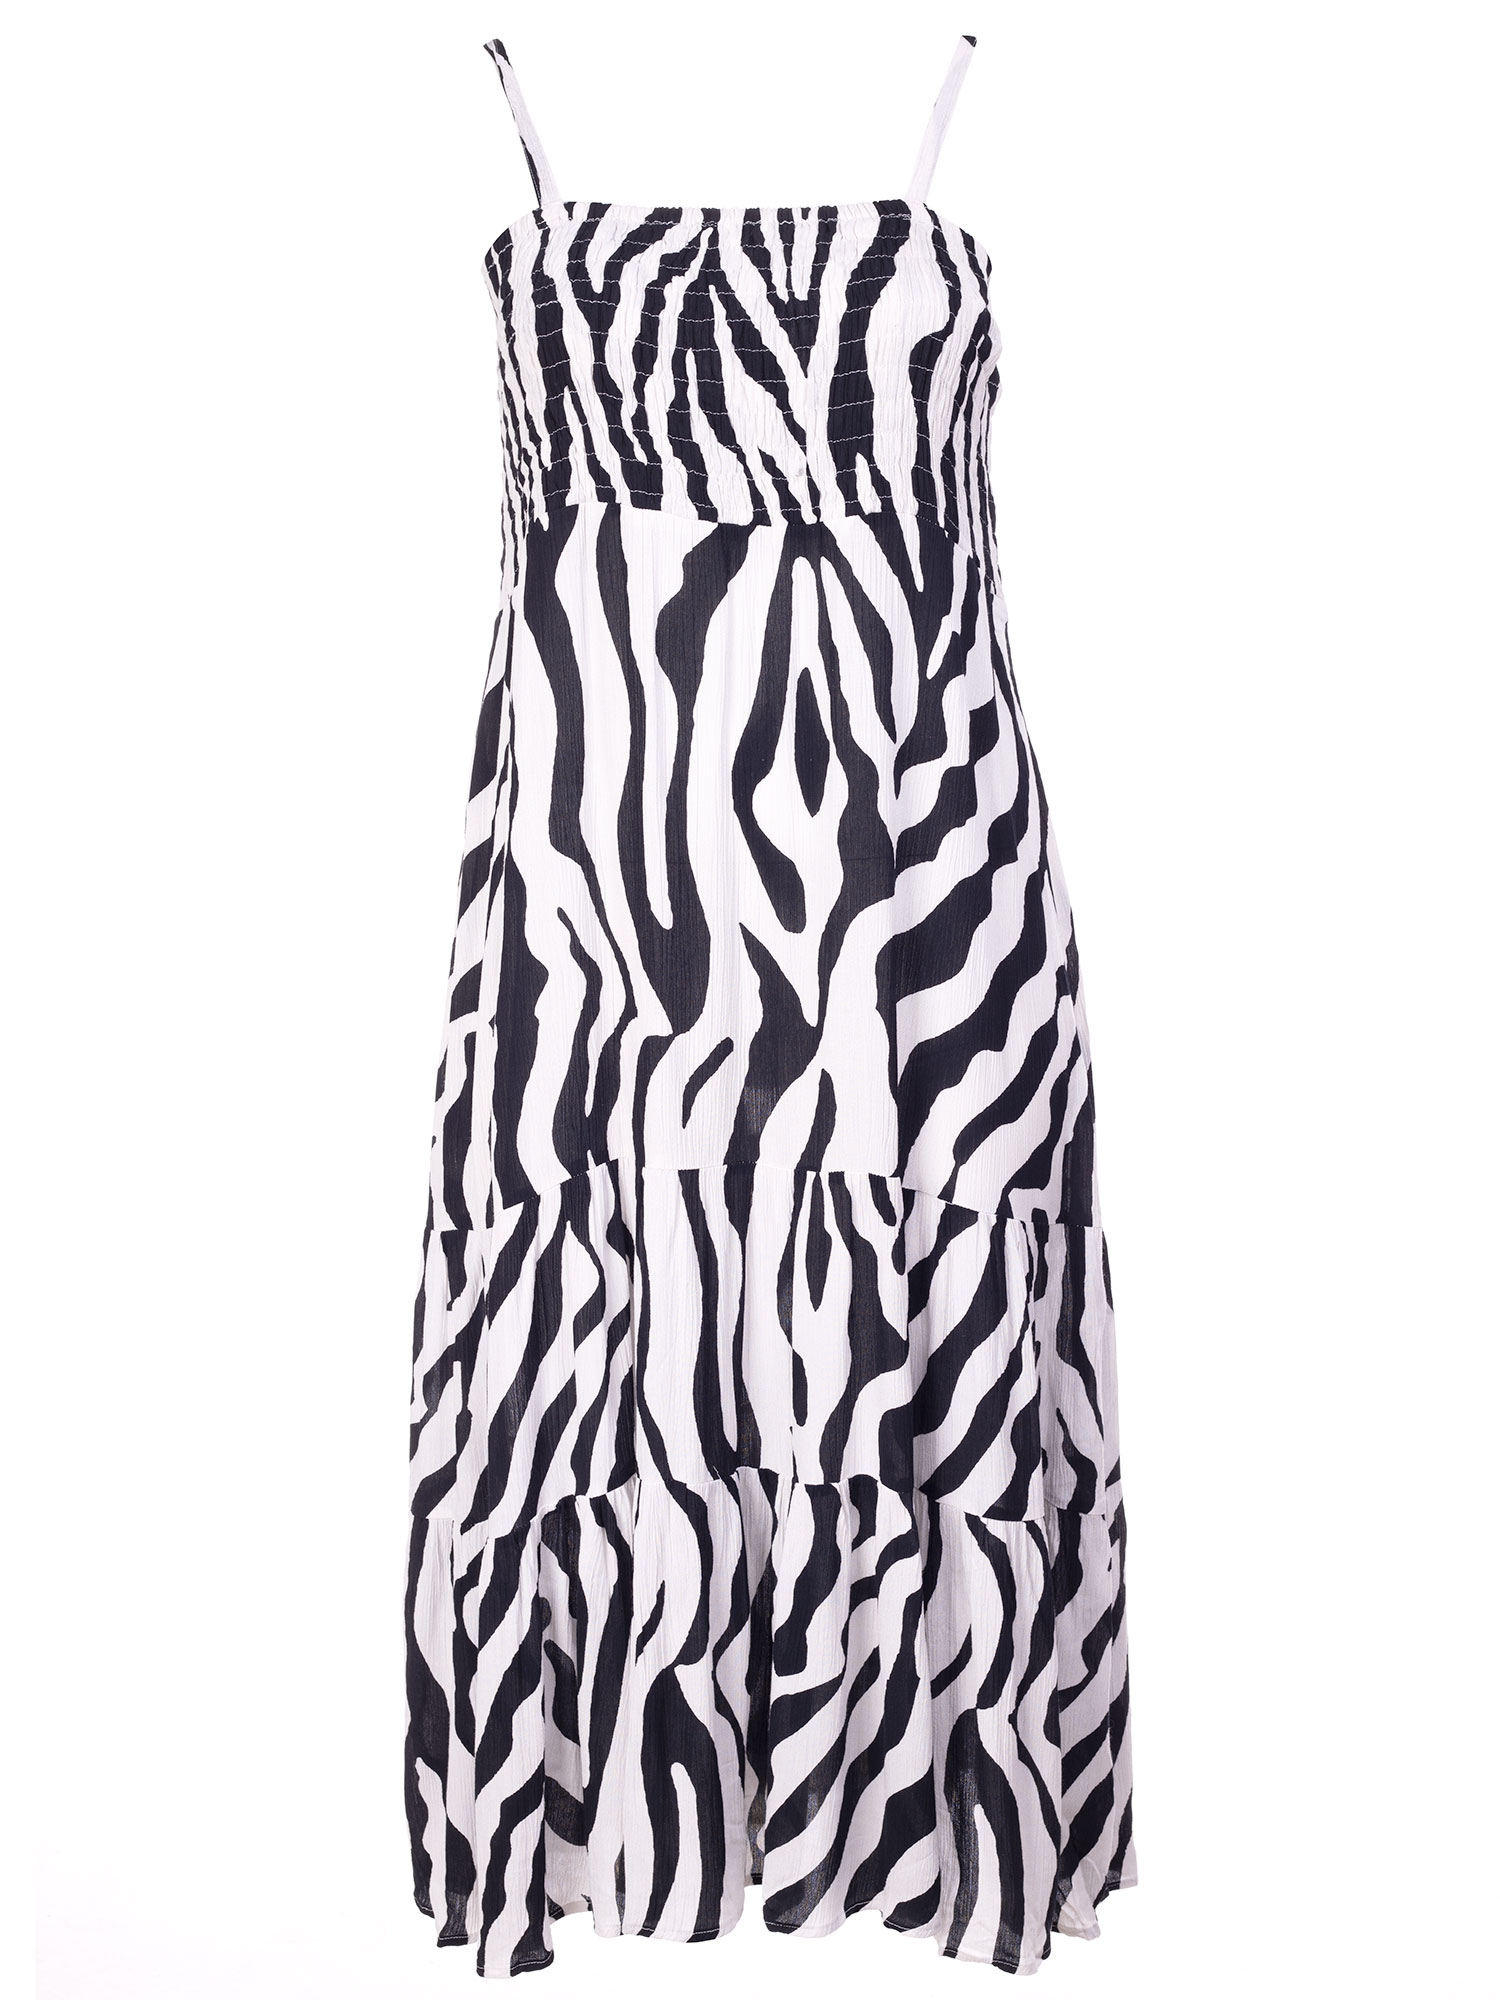 Lang hvid kjole med dyreprint